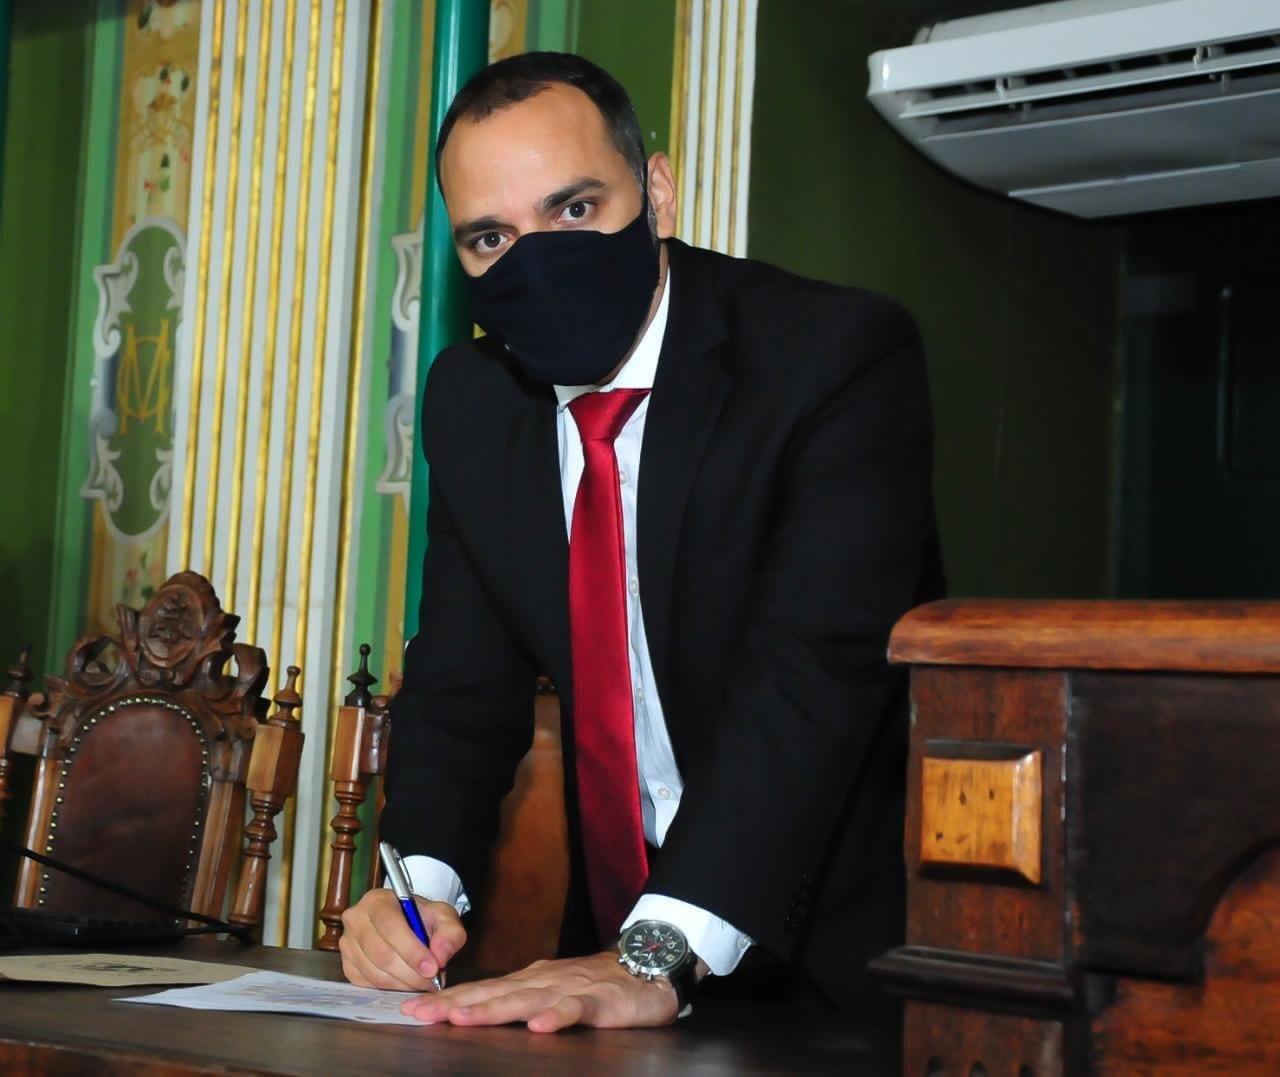 Vereador Augusto Vasconcelos cria projeto de lei para isentar microempresas e empresas de pequeno porte do IPTU durante pandemia